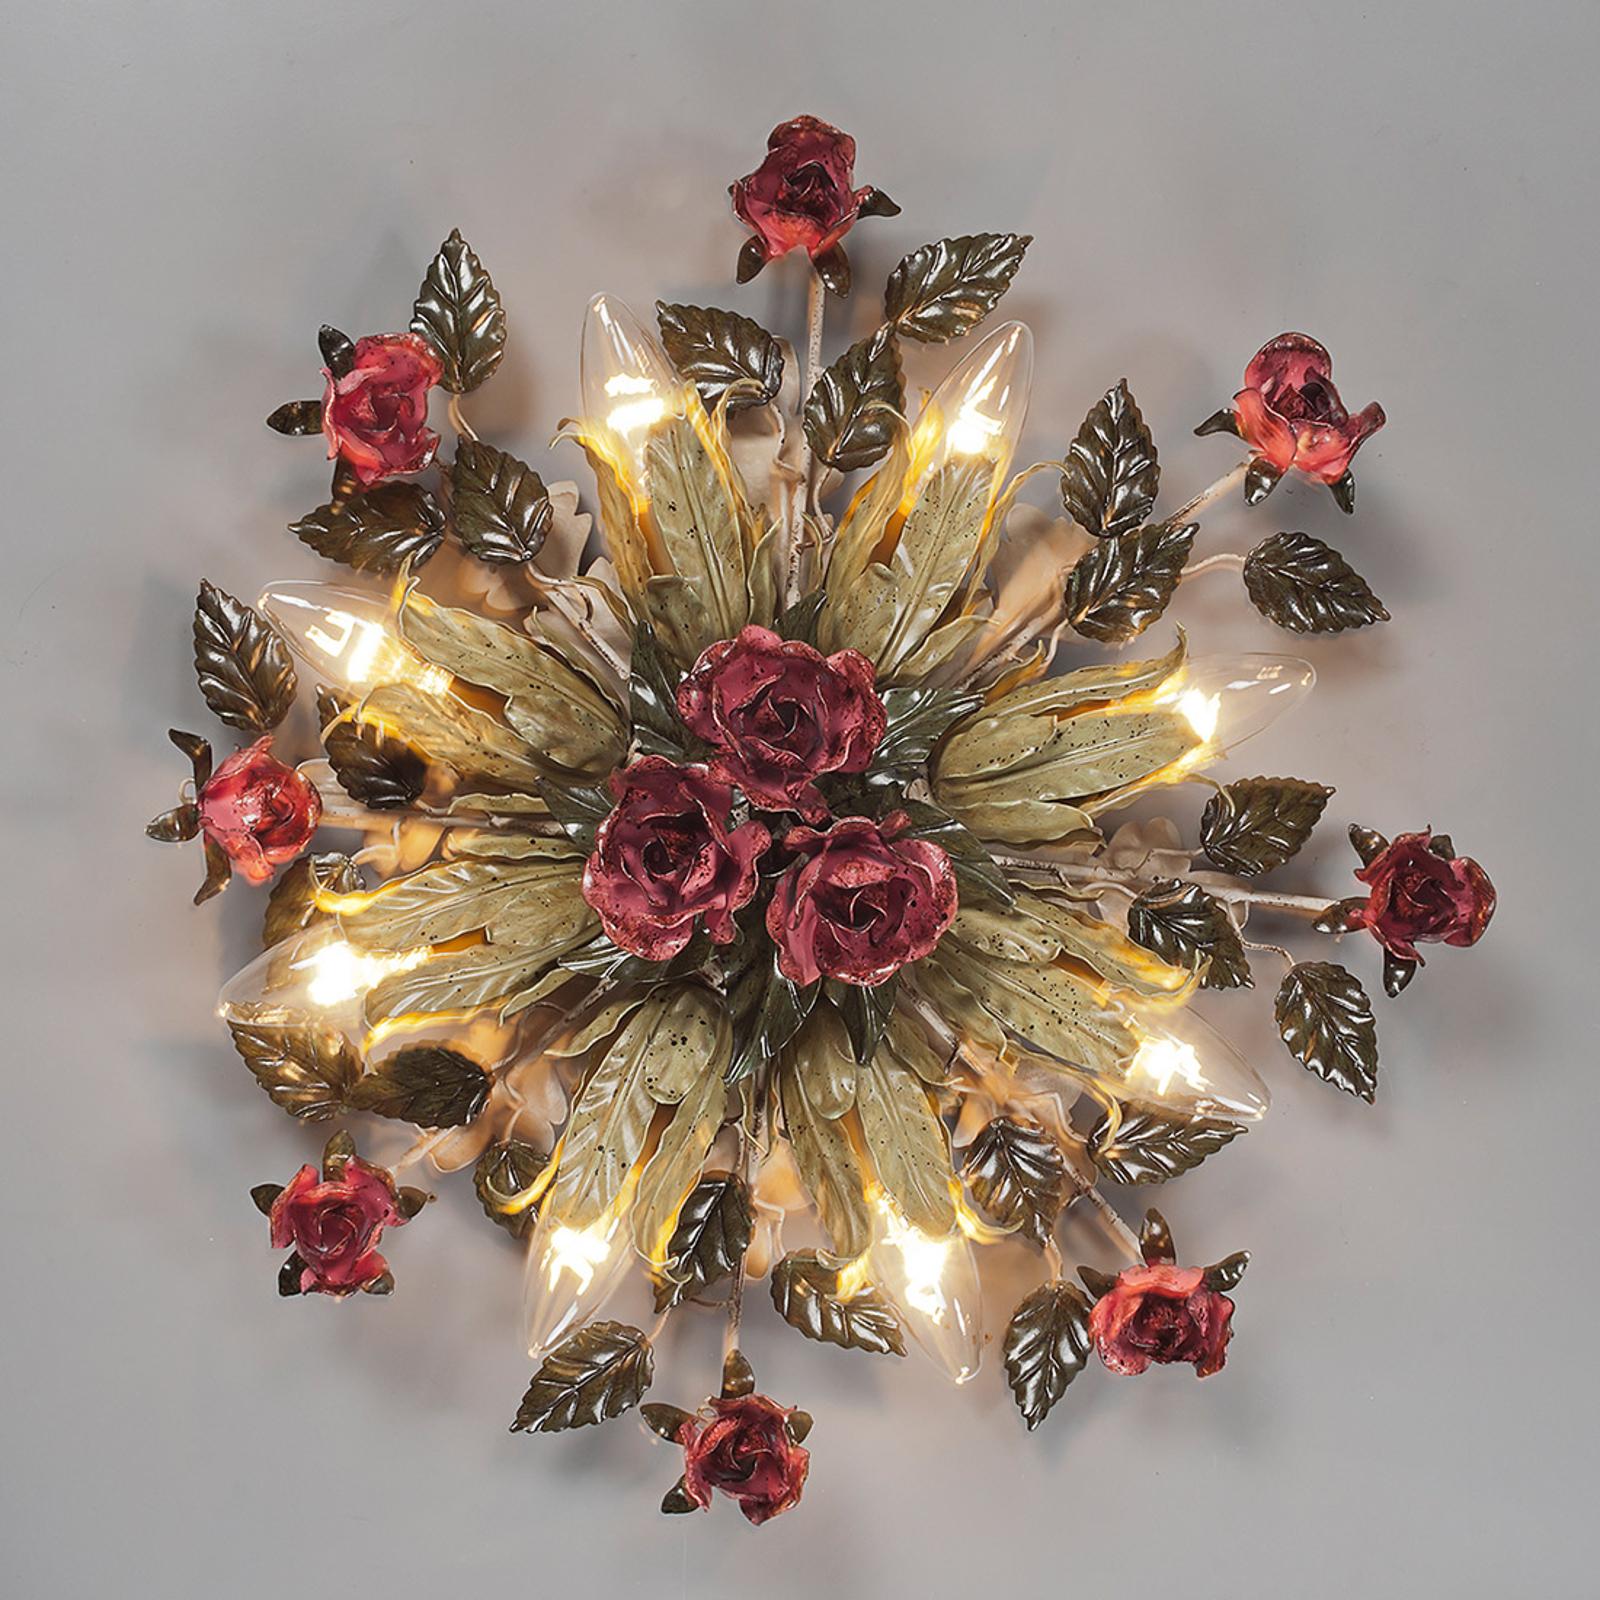 Fiama eight-bulb Florentine ceiling light_3532122_1